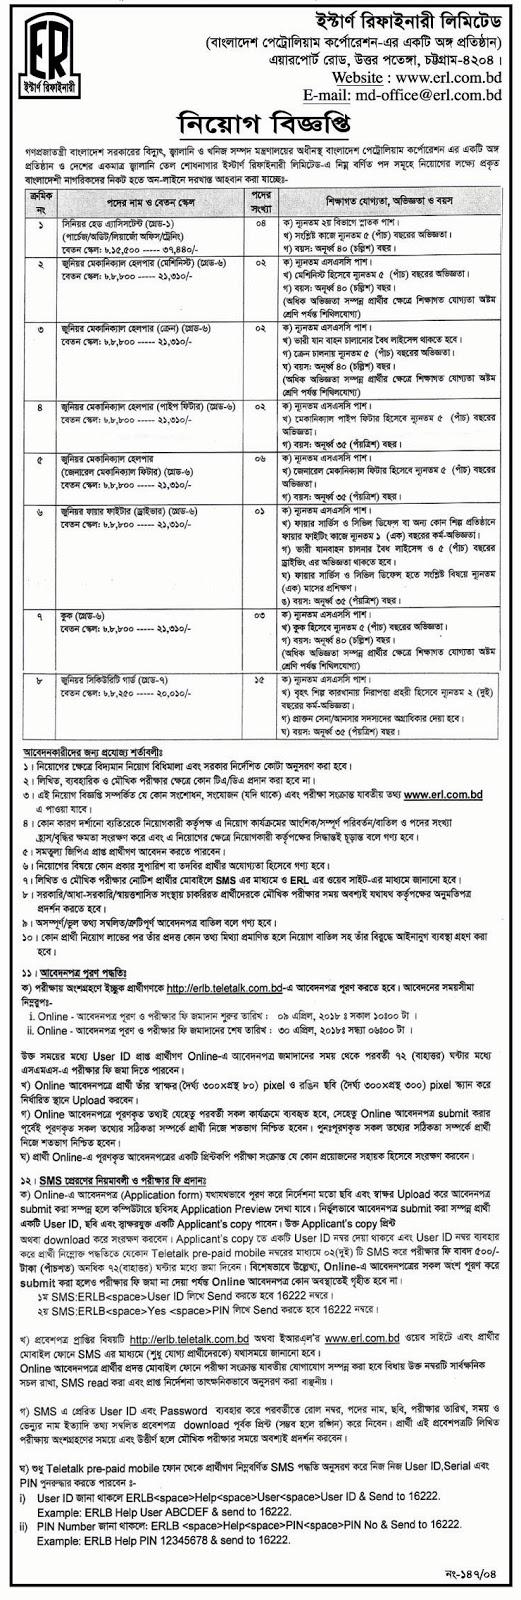 Eastern Refinery Limited (ERL) Job Circular 2018